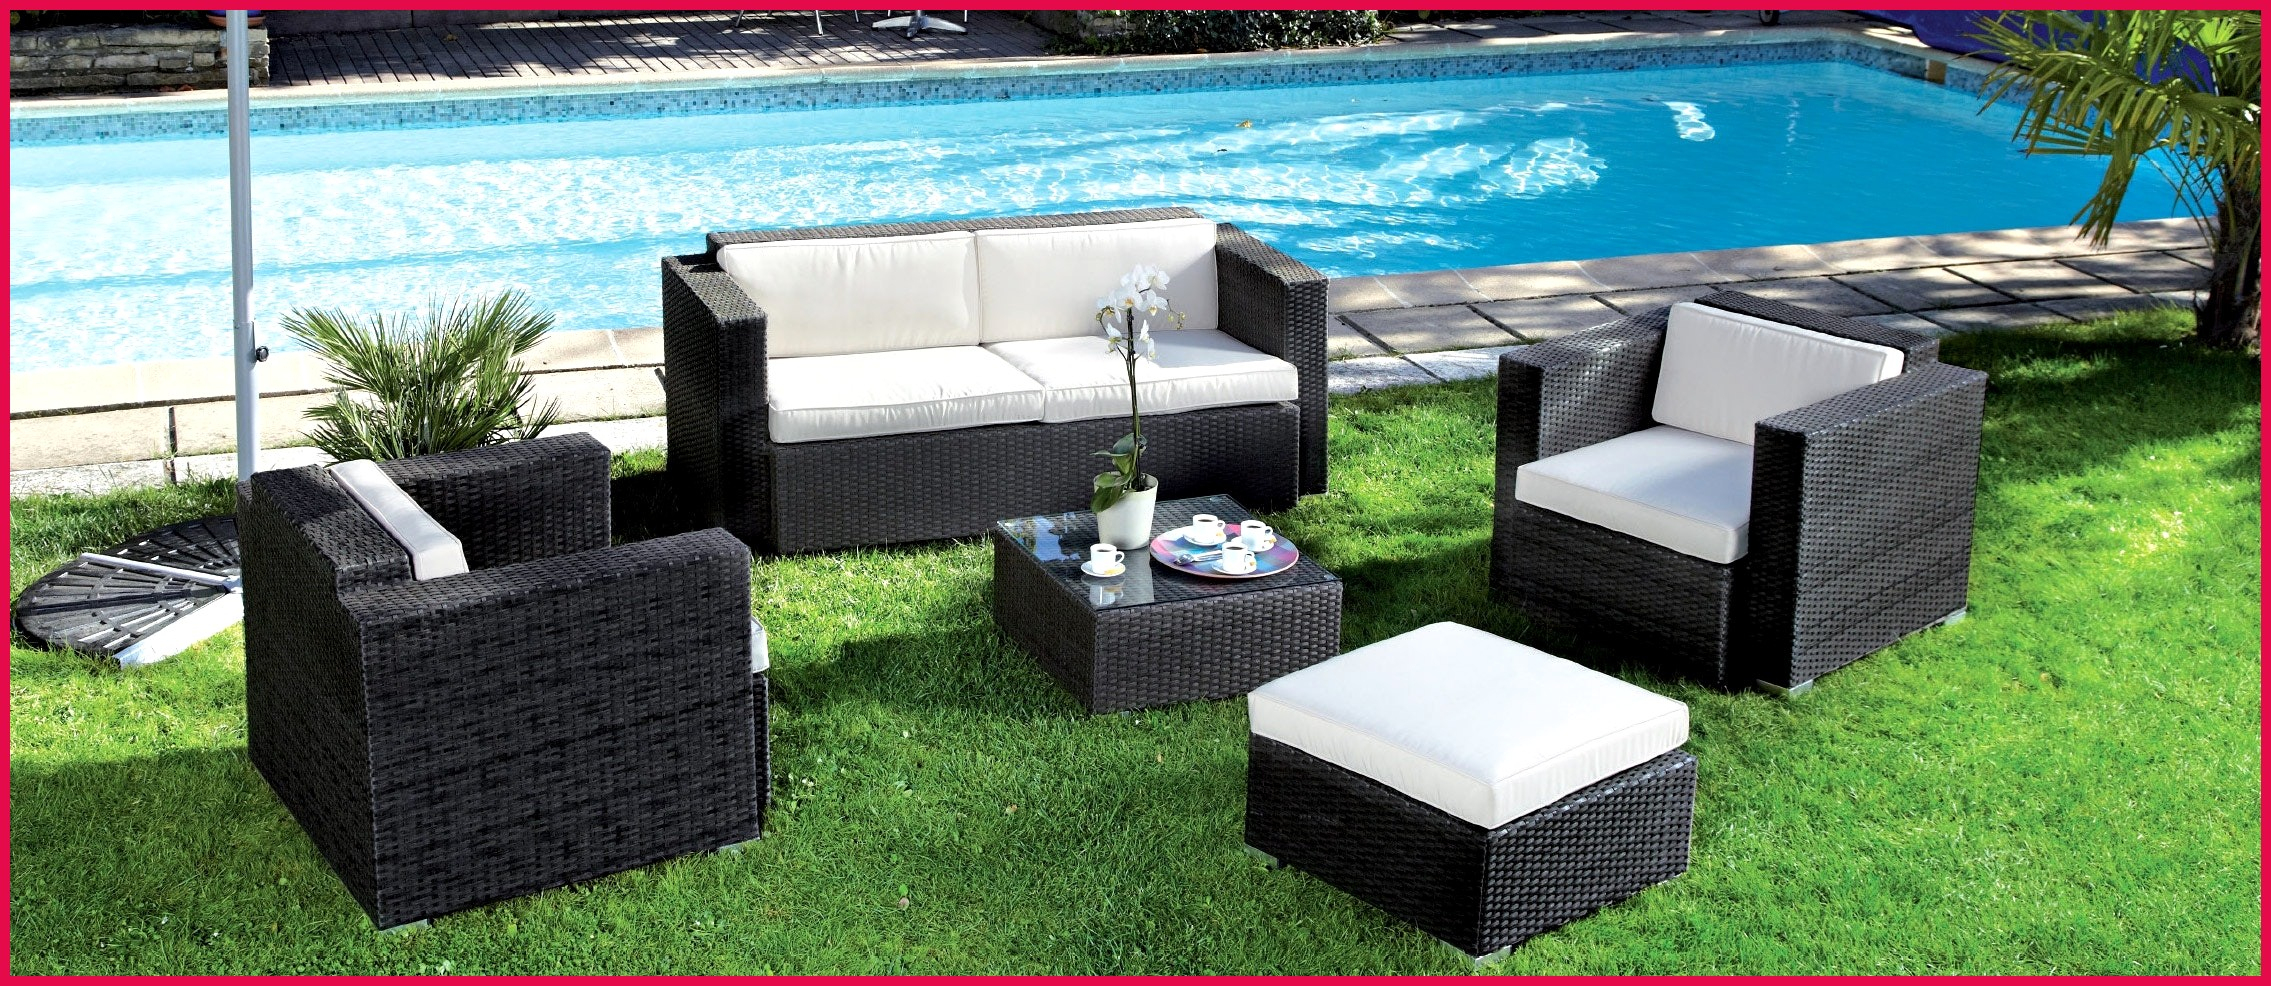 Hyper U Coffre De Rangement | Venus Et Judes avec Salon De Jardin Super U